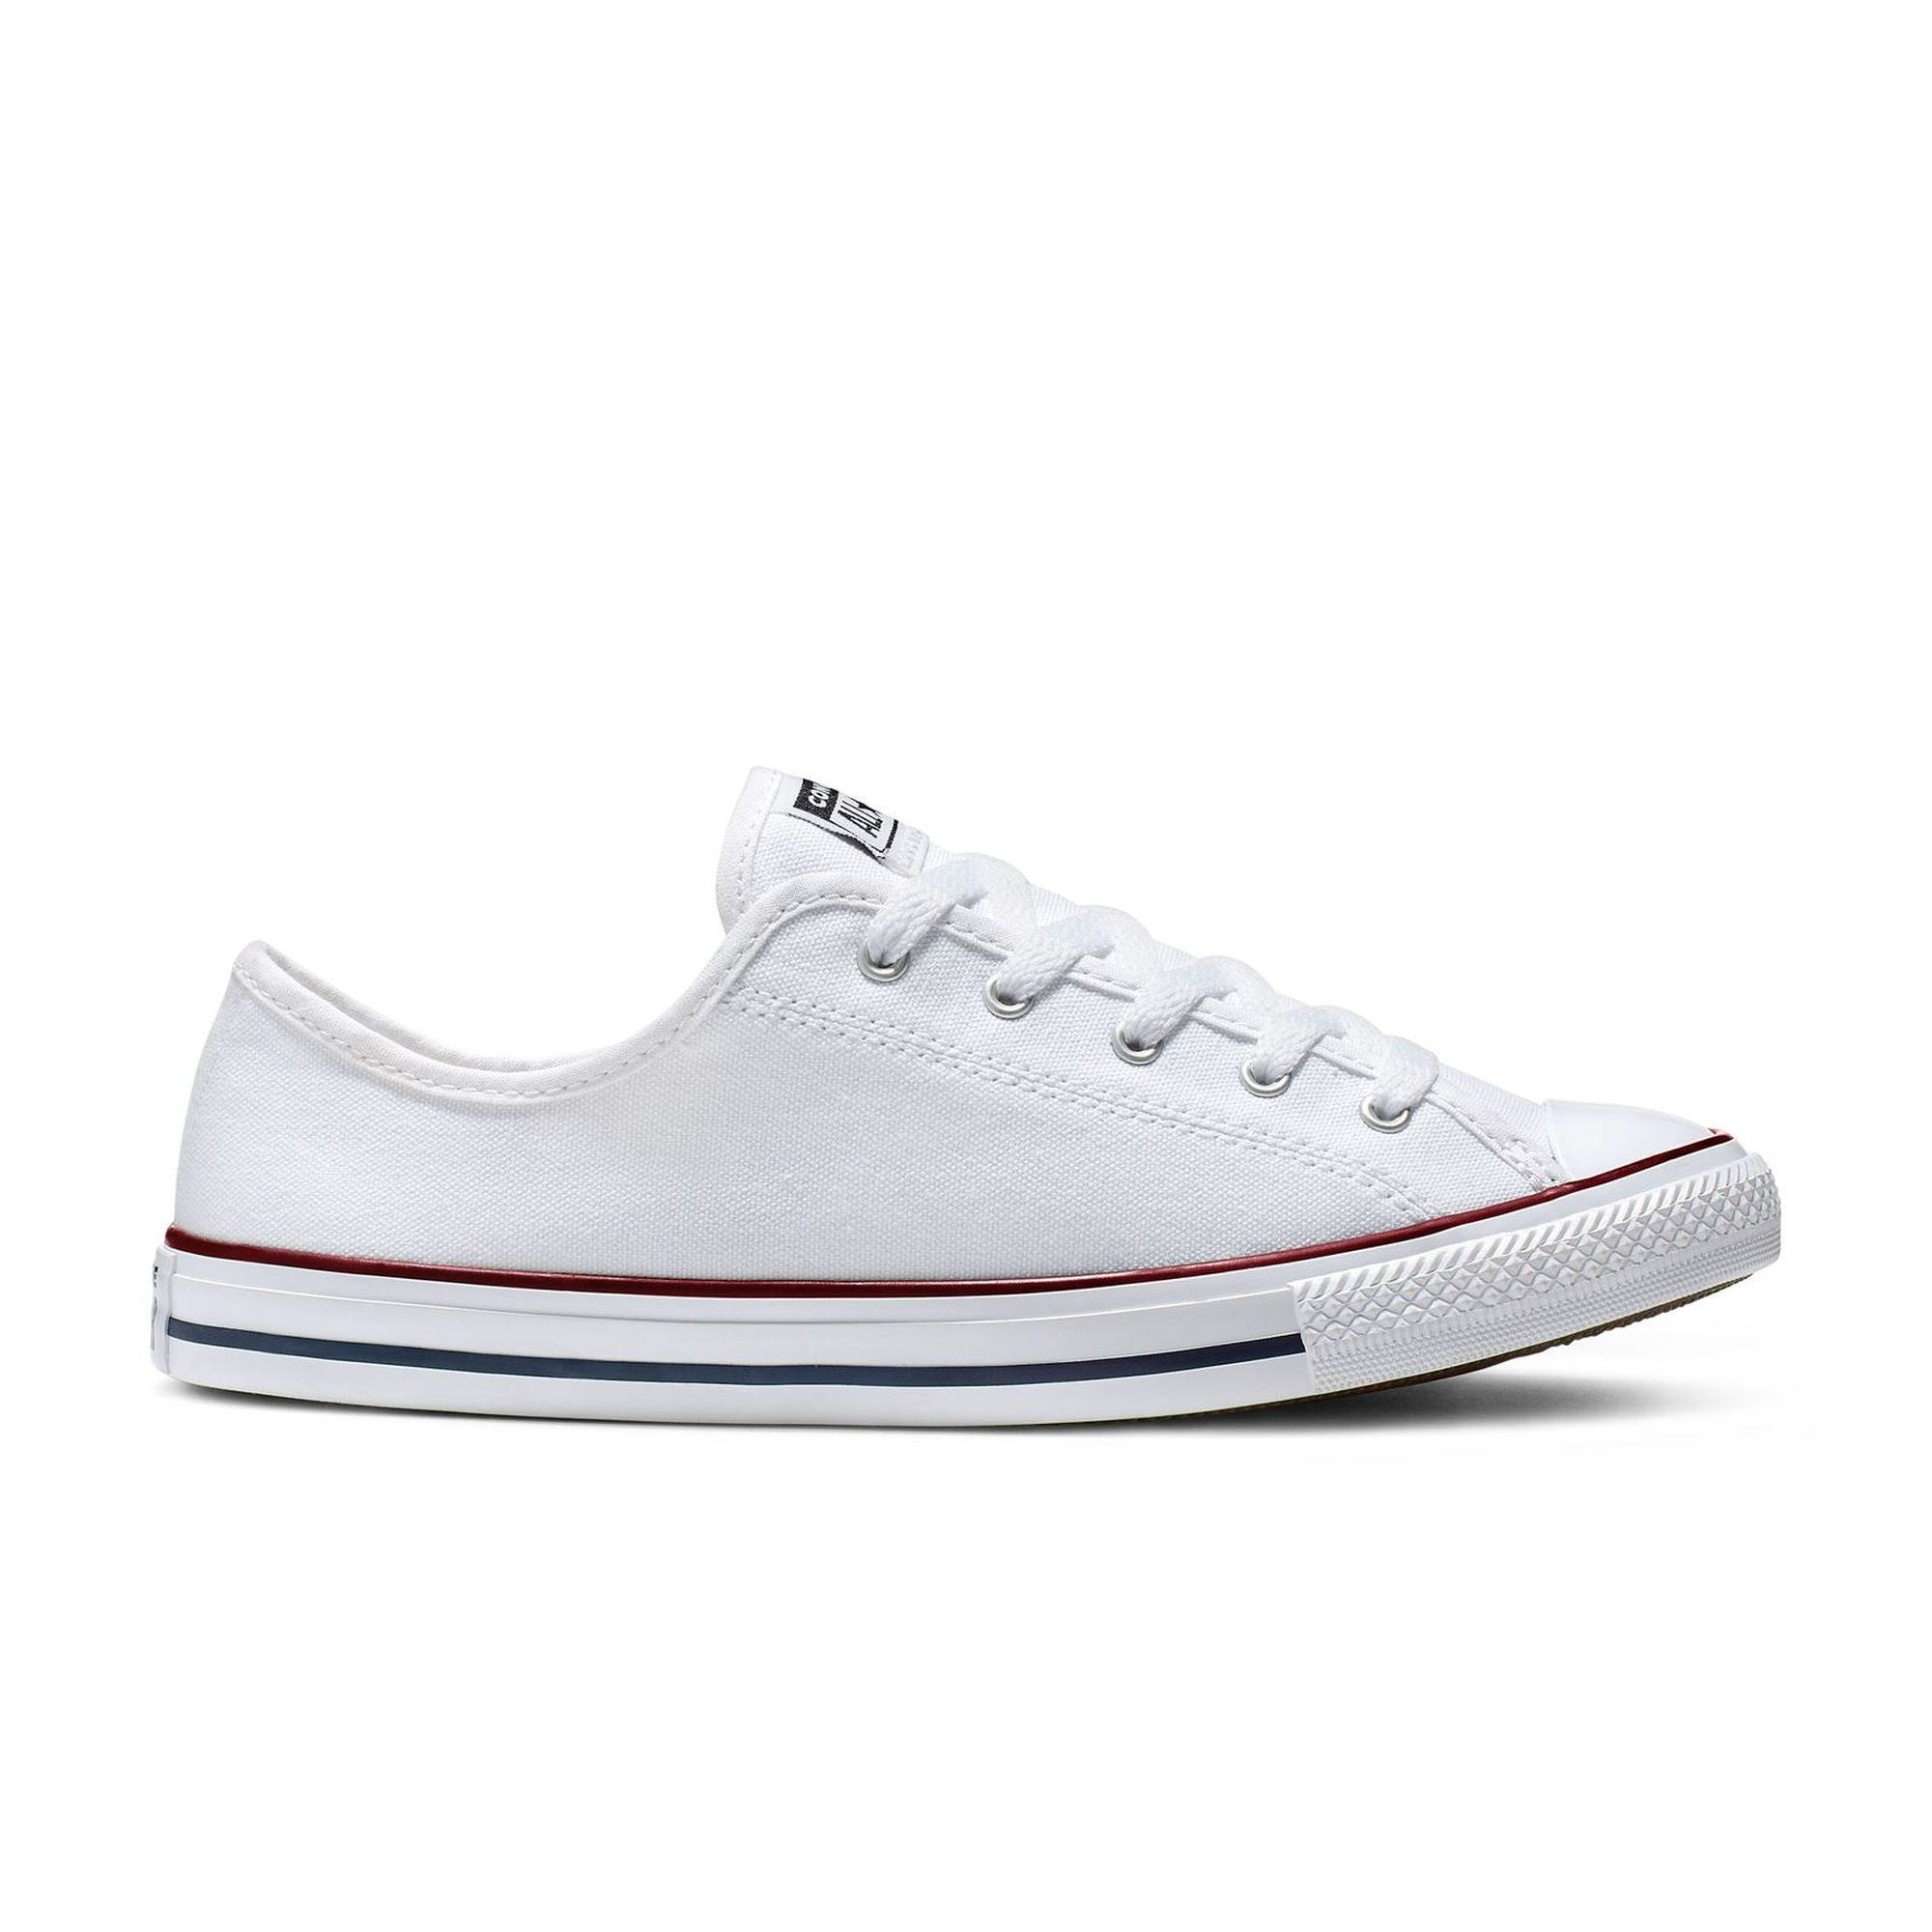 Buy Converse Sneakers Online   lazada.sg